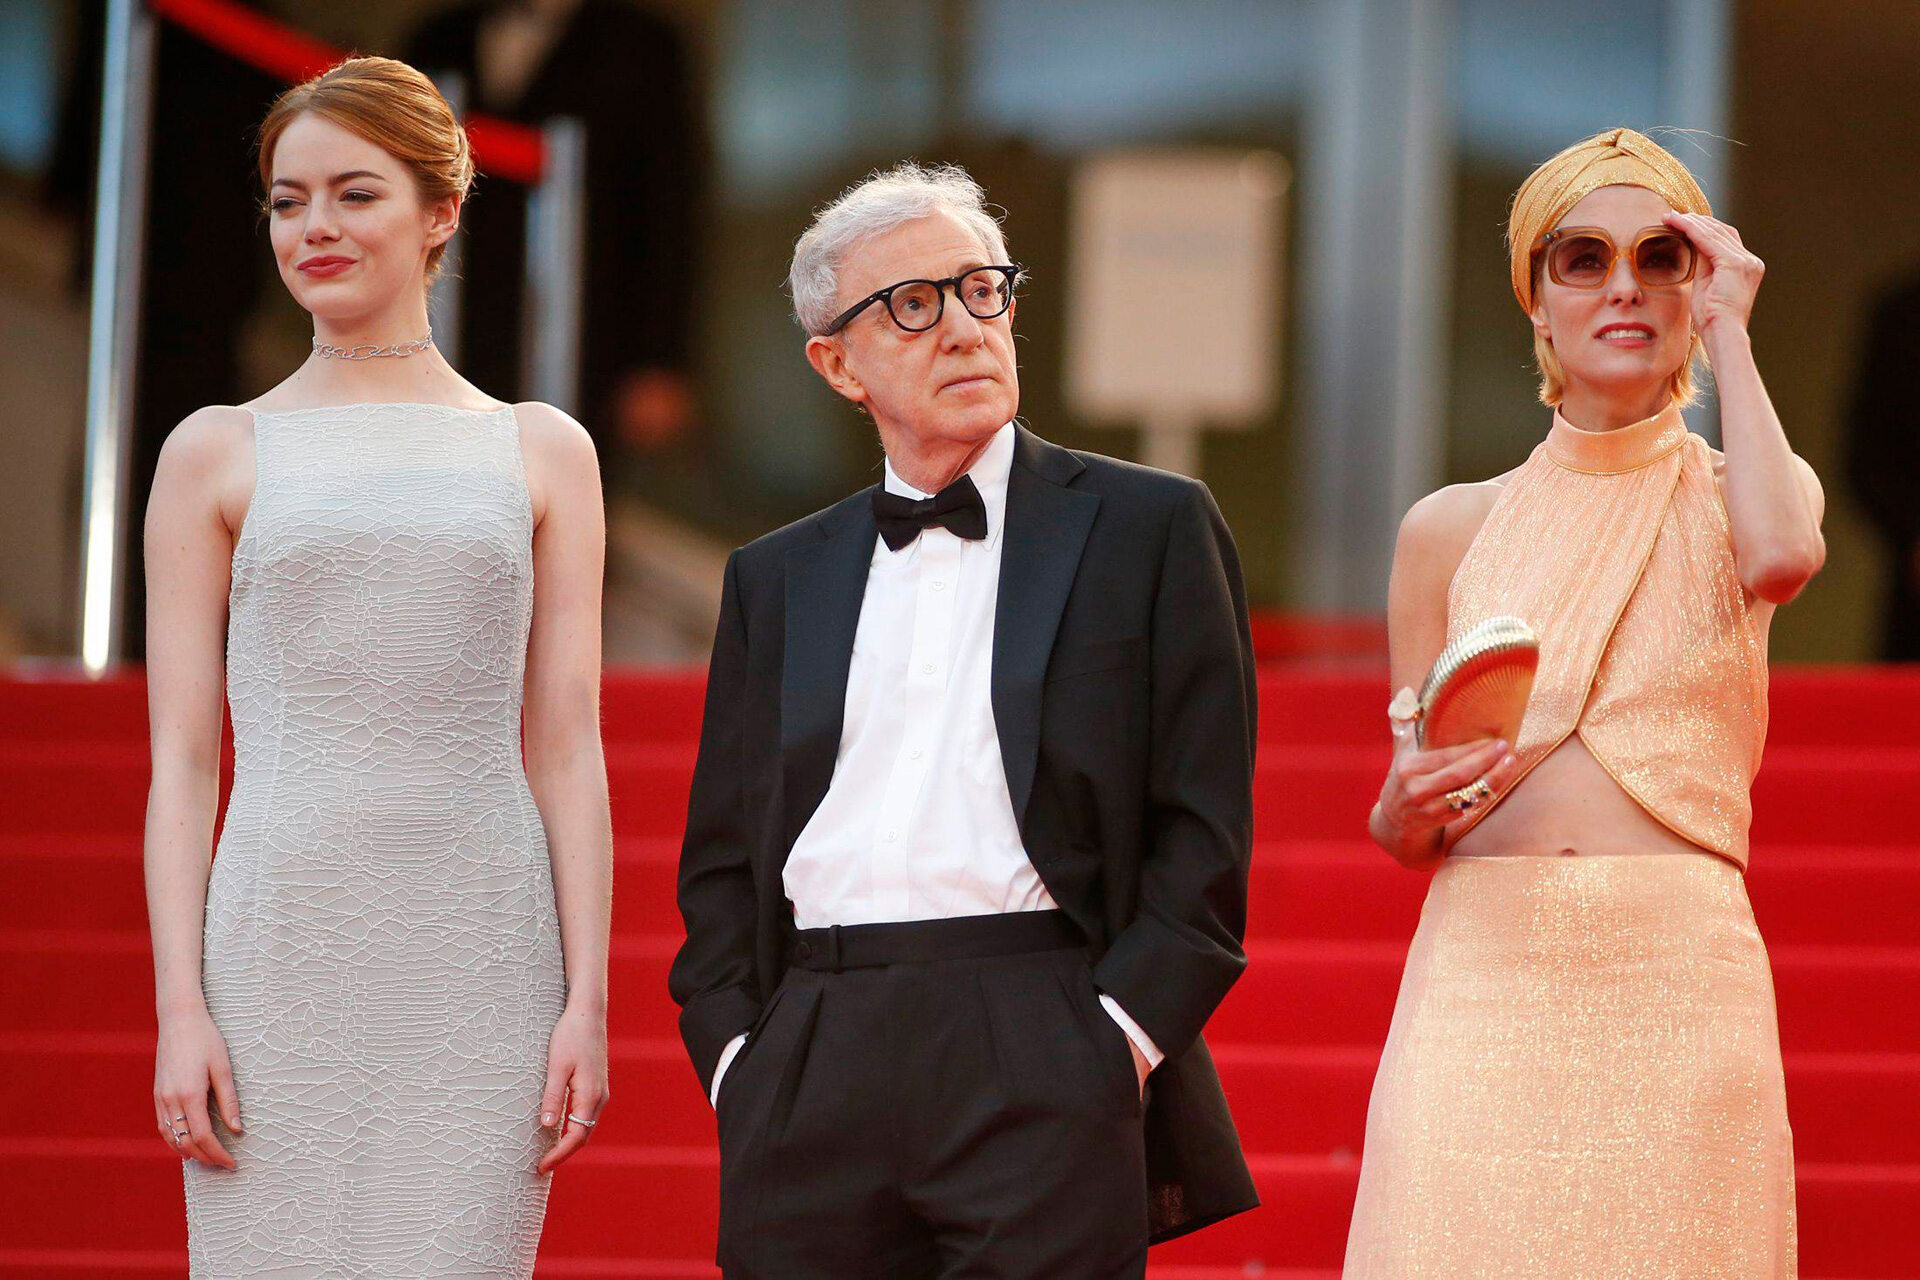 Emma Stone, Woody Allen, Parker Posey w Cannes